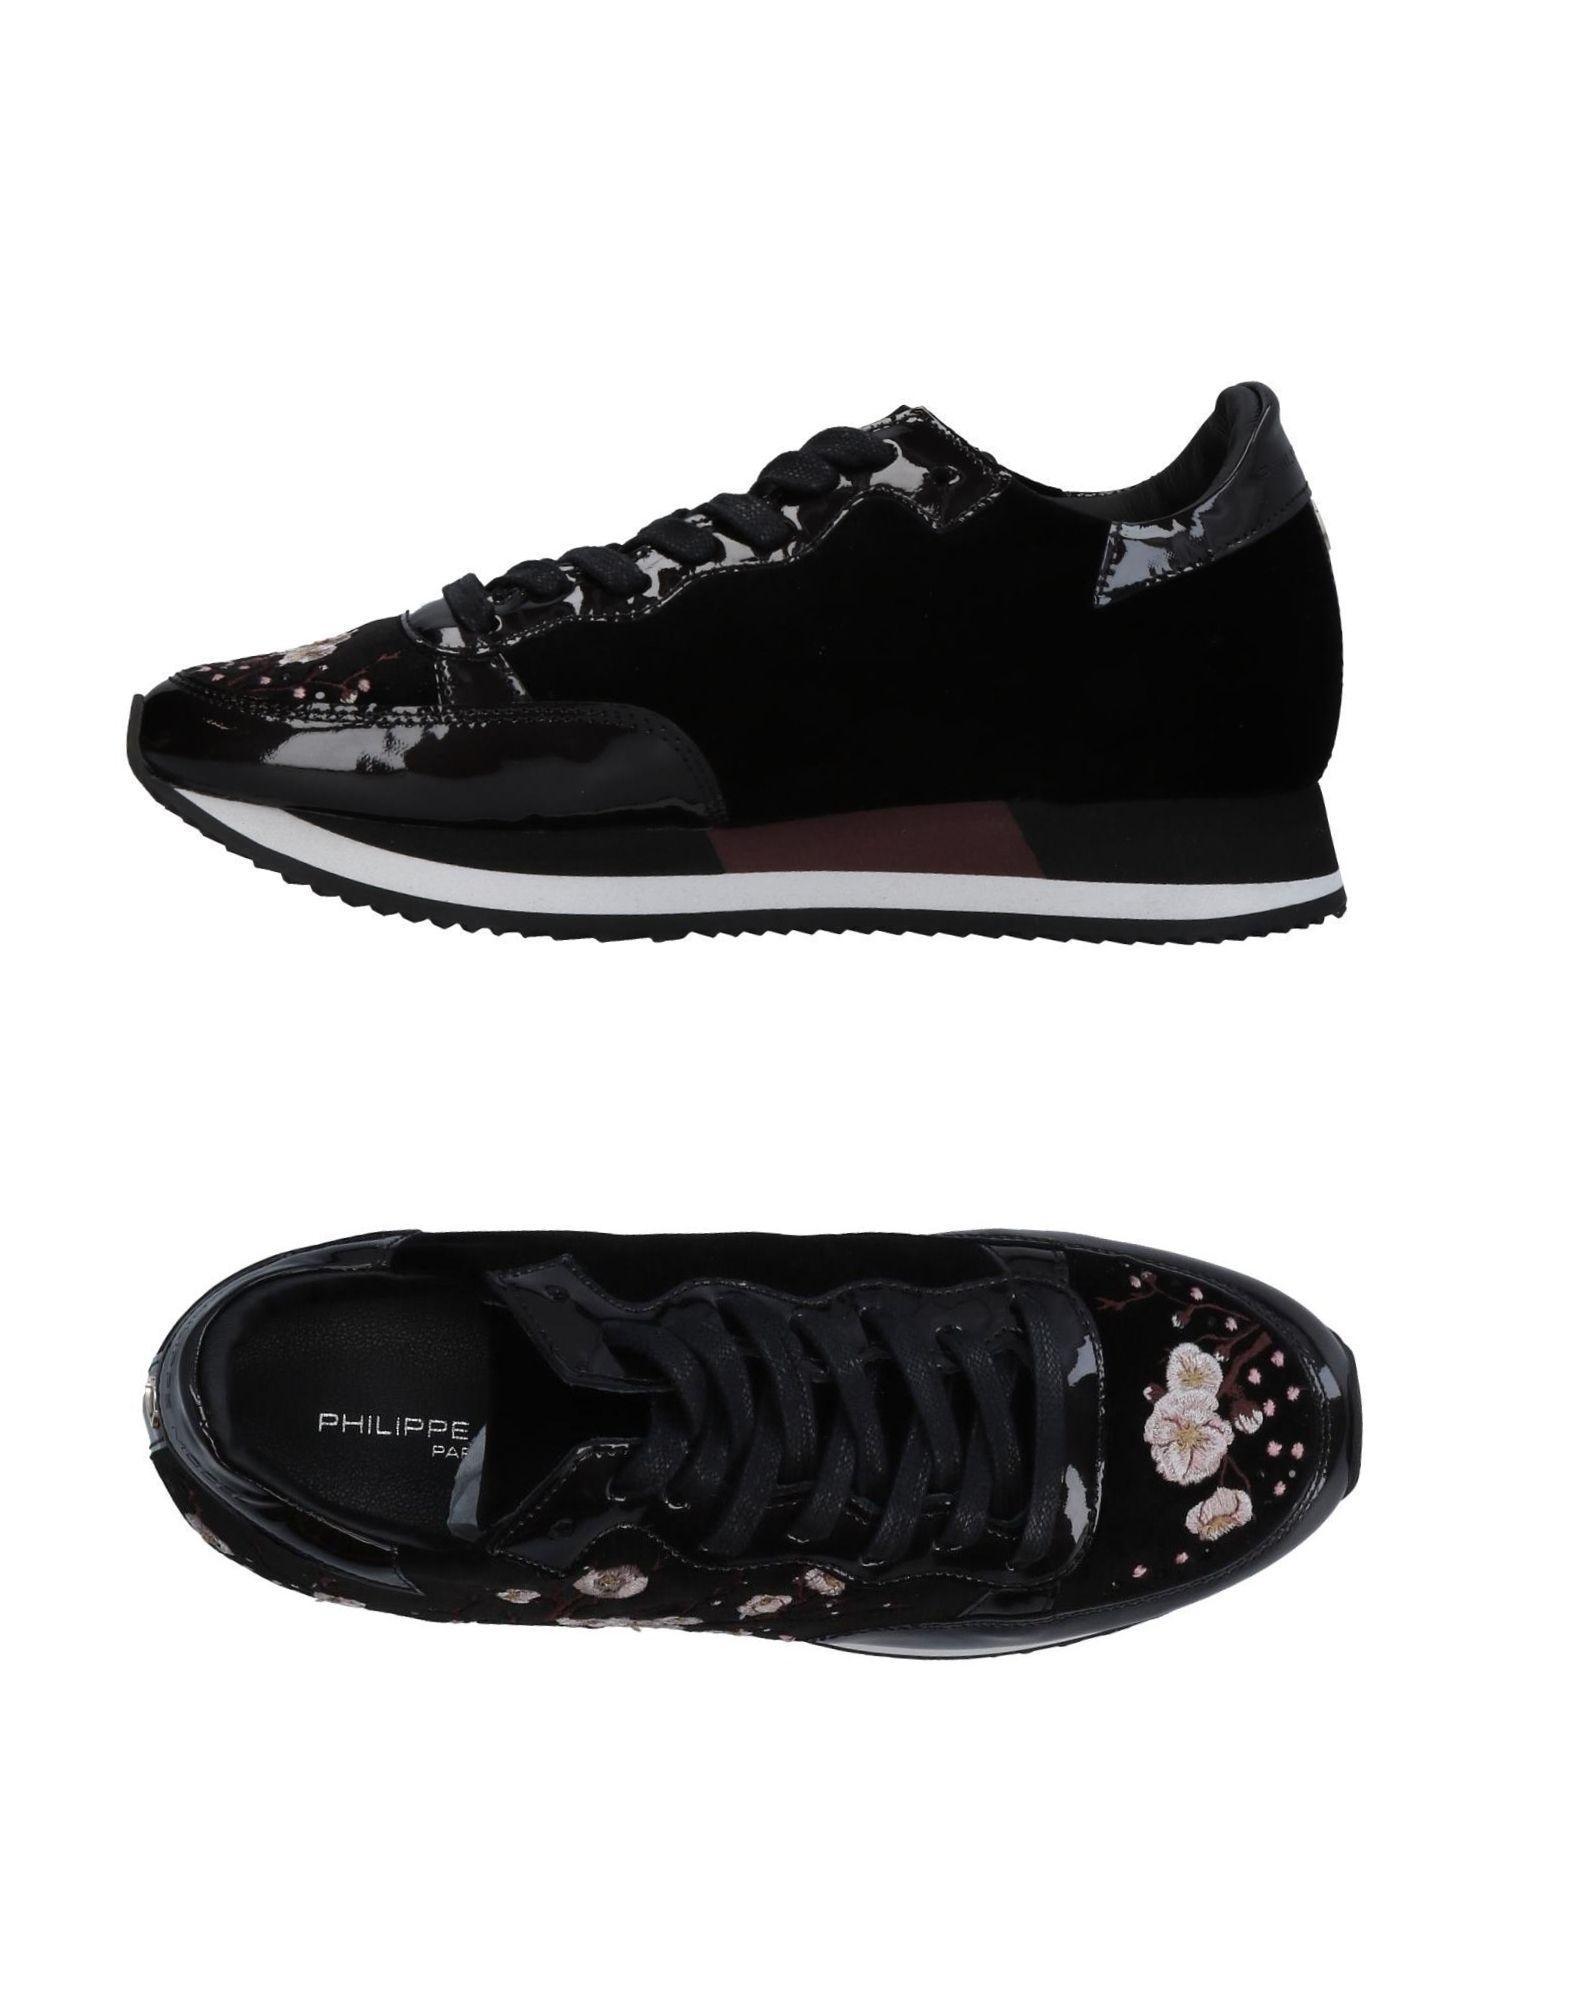 Philippe Model Sneakers In Black